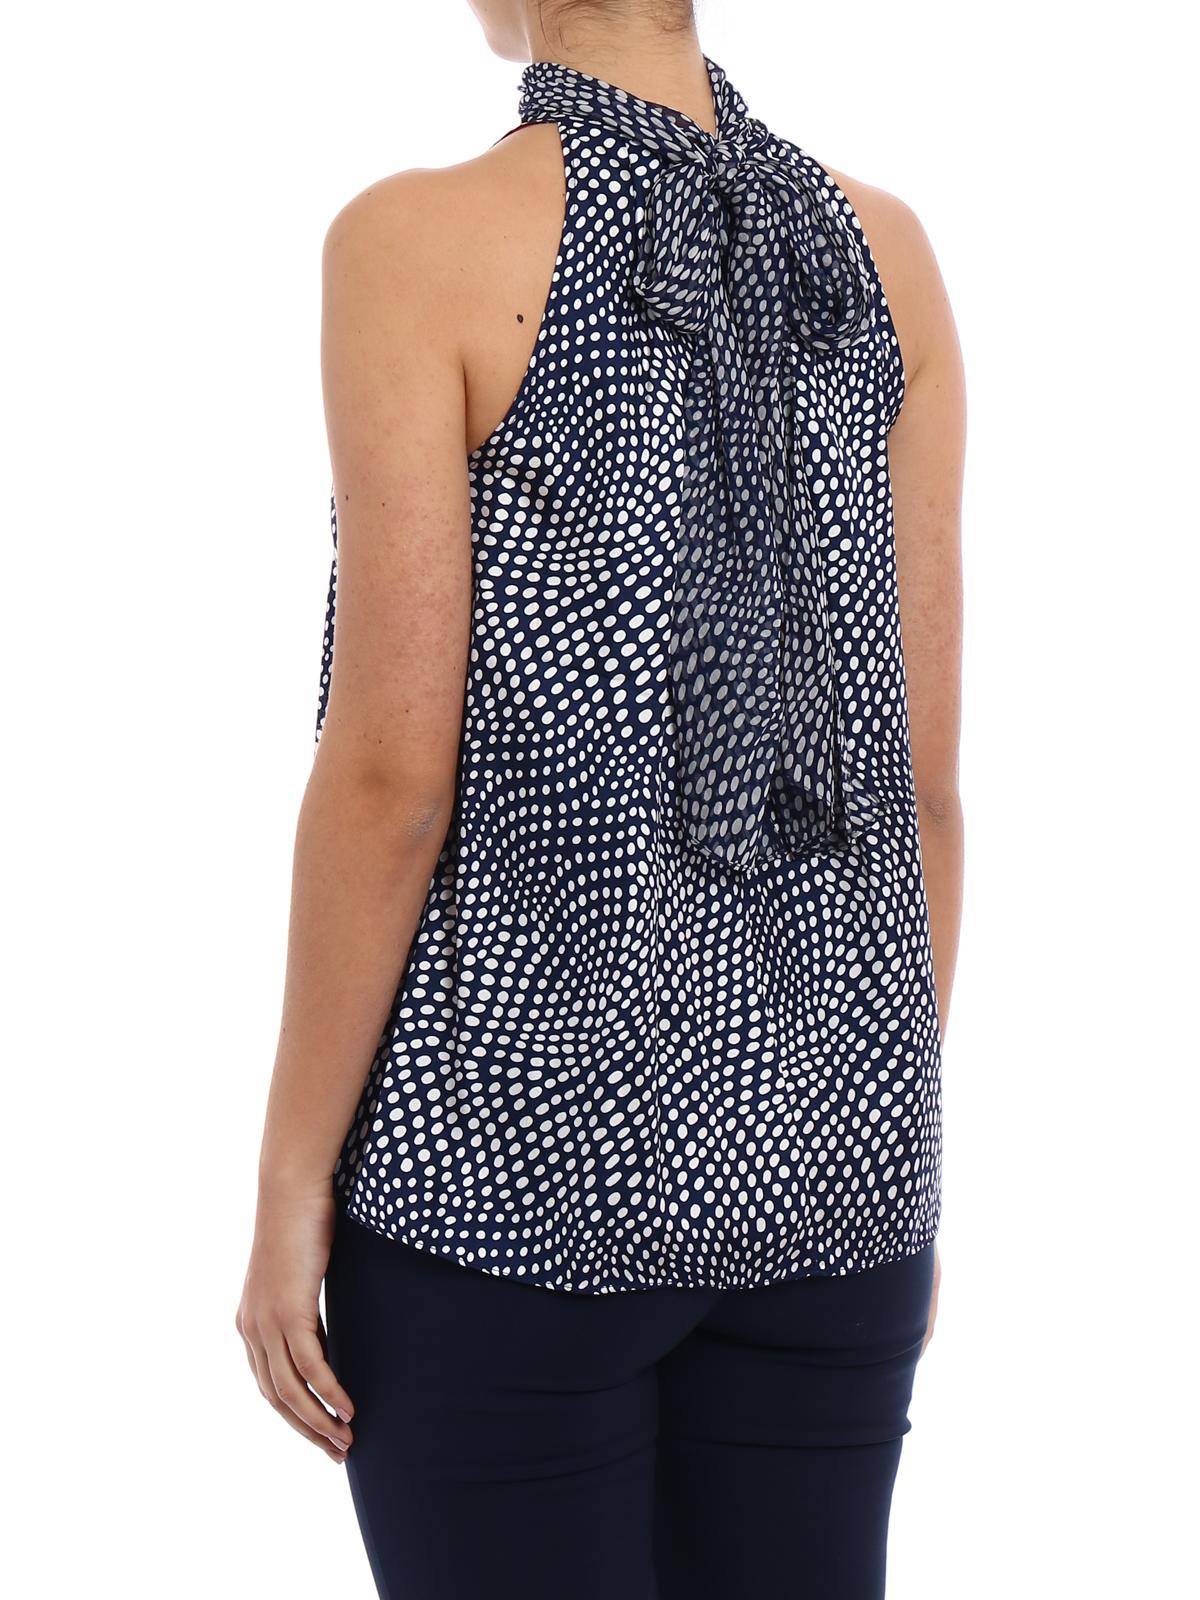 Furstenberg Diane Von Tops Camisetas Sin Top Multicolor Y HH5rSnawq